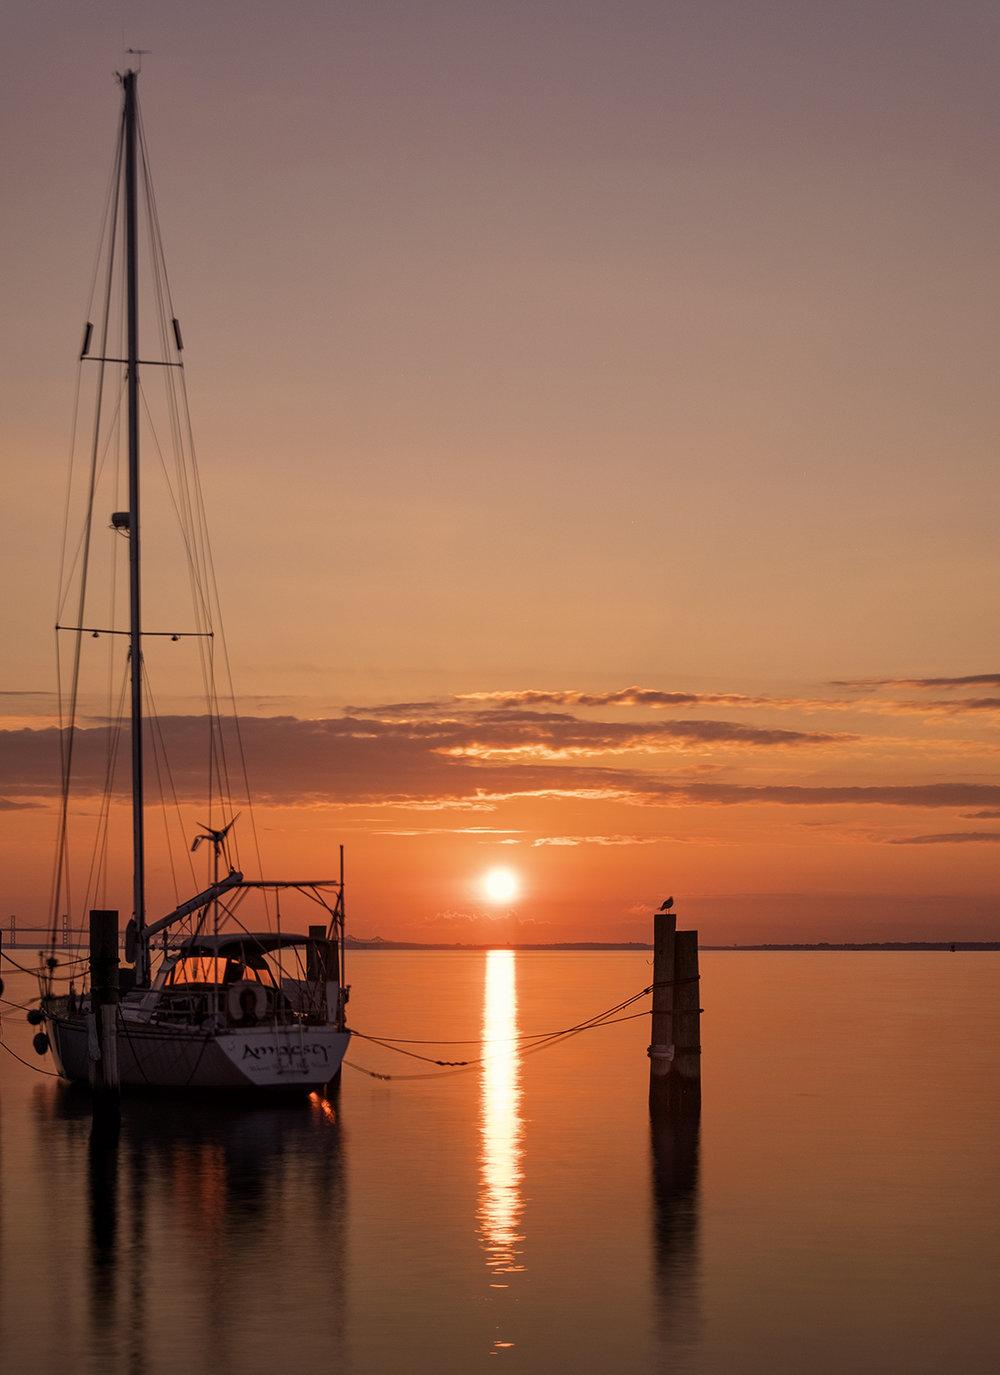 180903 Annapolis Sunrise 68-1 alt 16x22.jpg